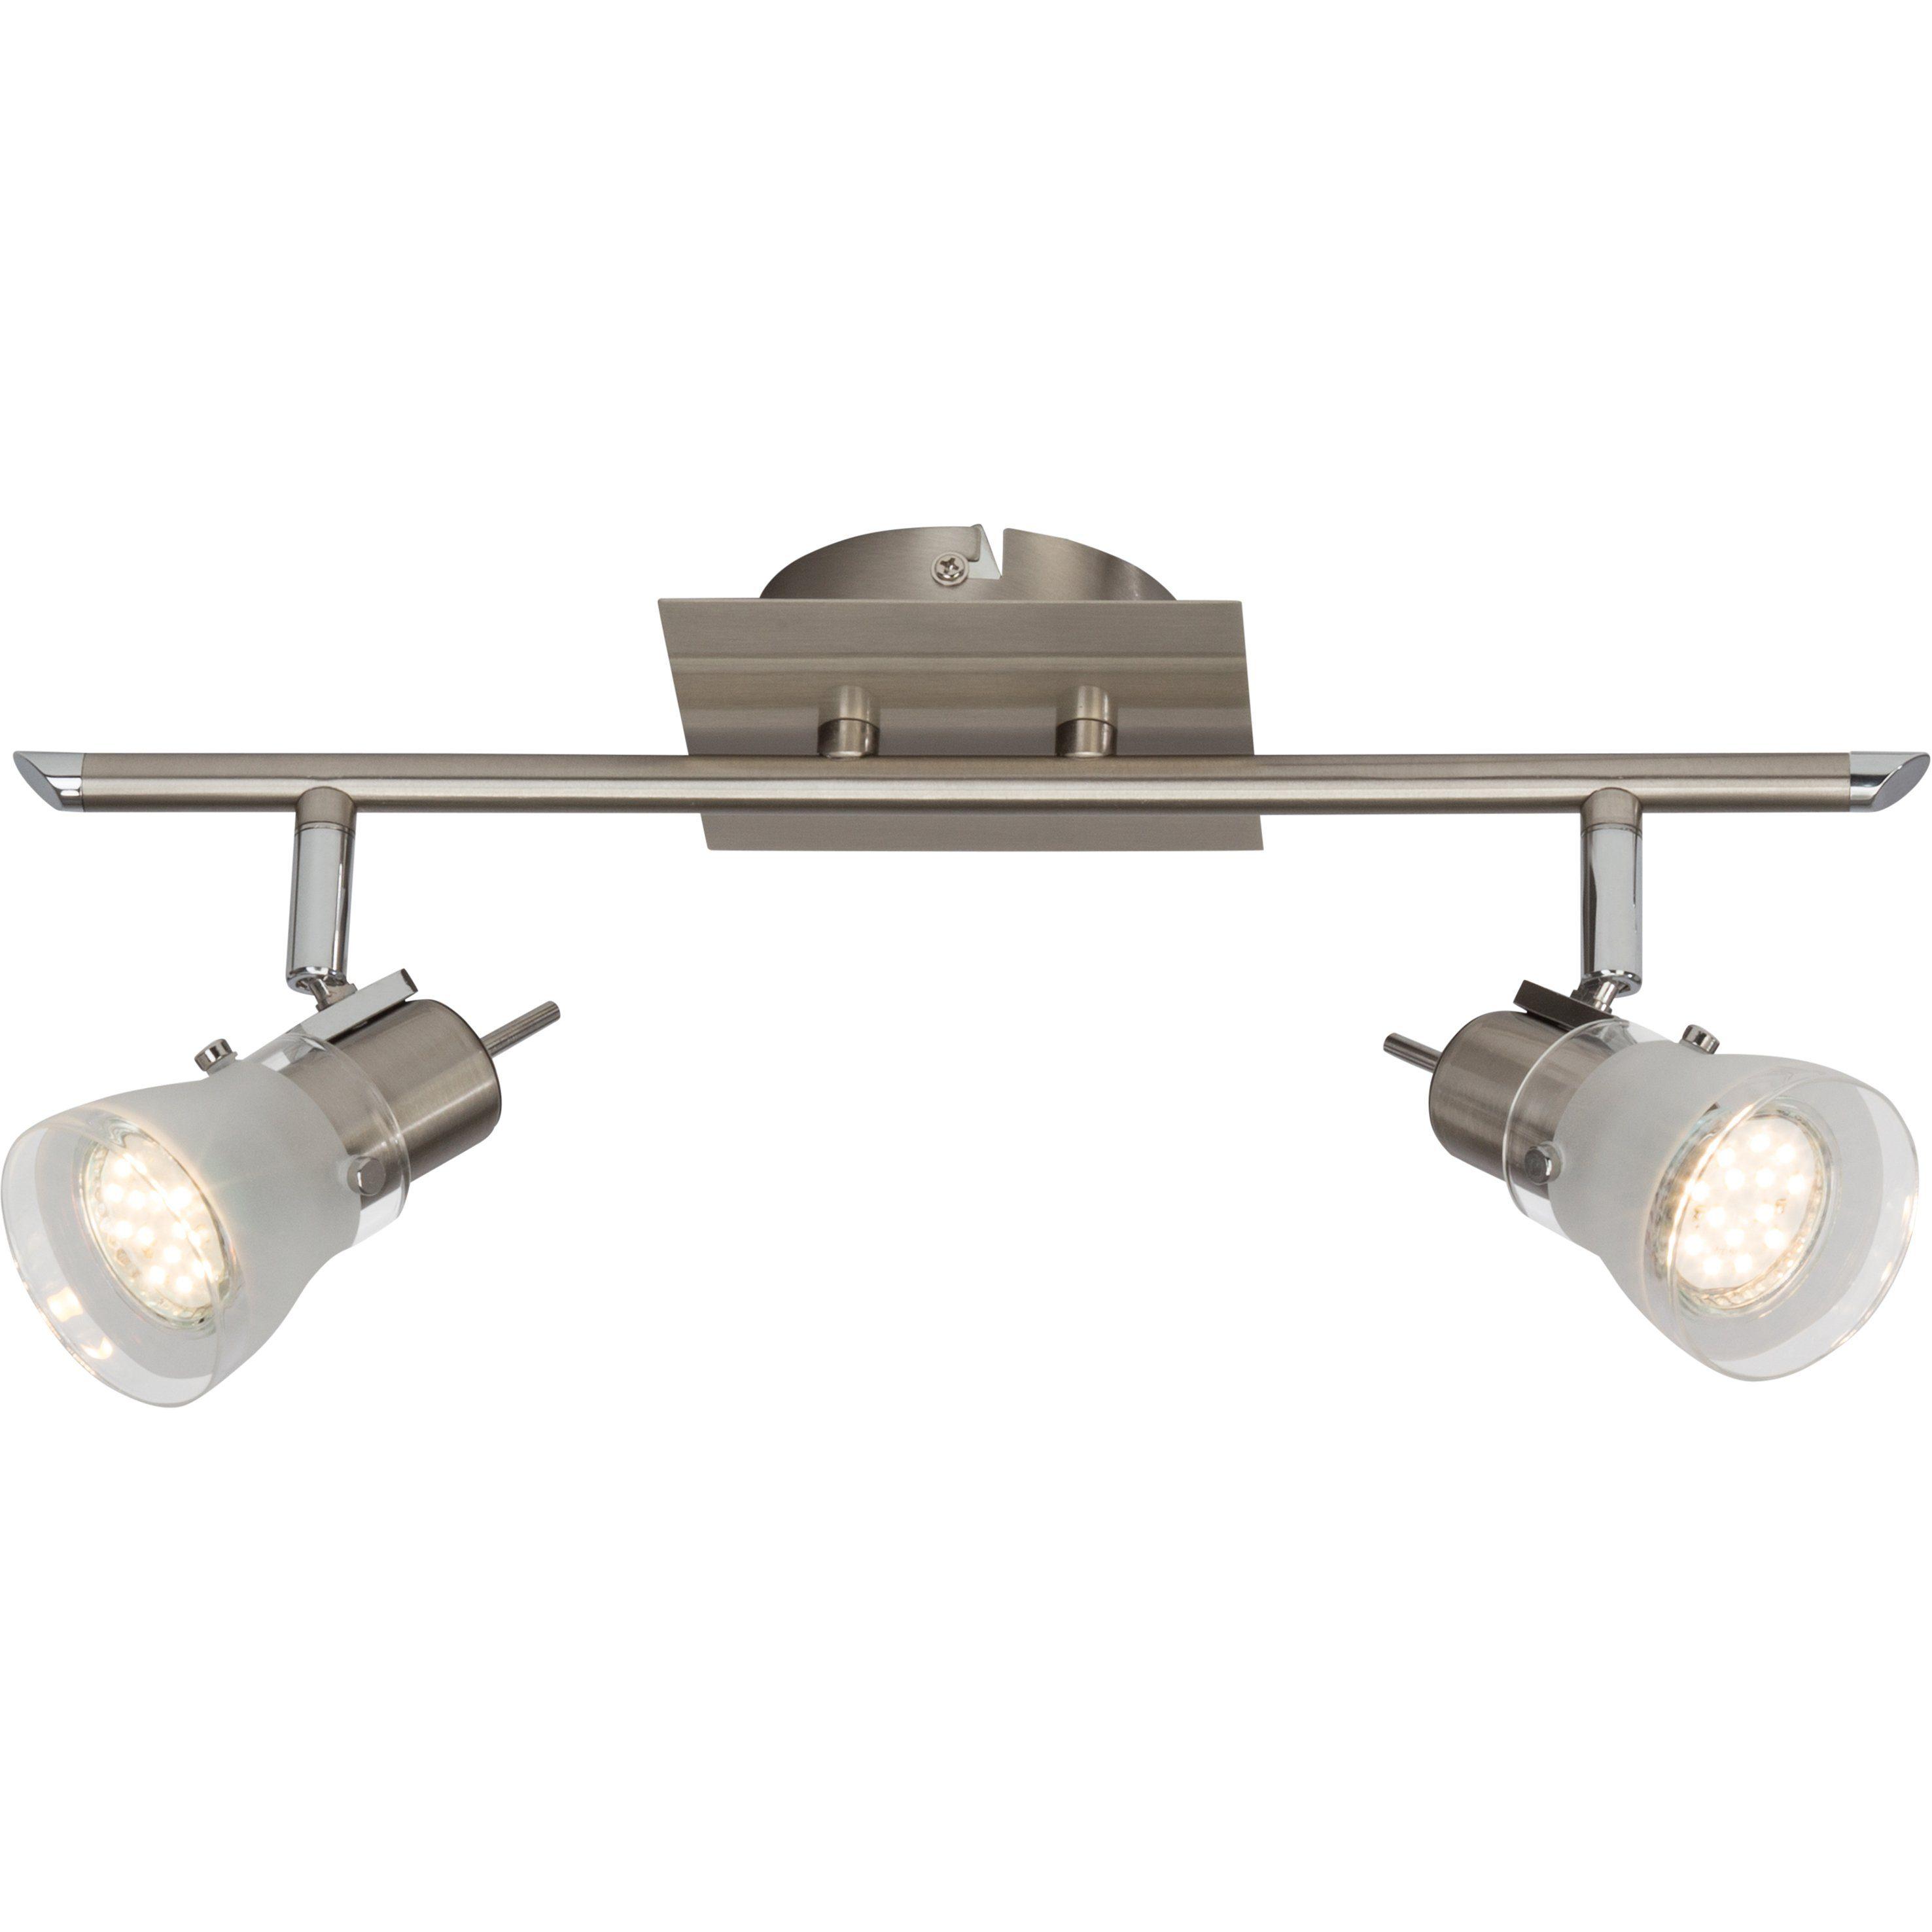 Brilliant Leuchten Lipari LED Spotrohr, 2-flammig eisen